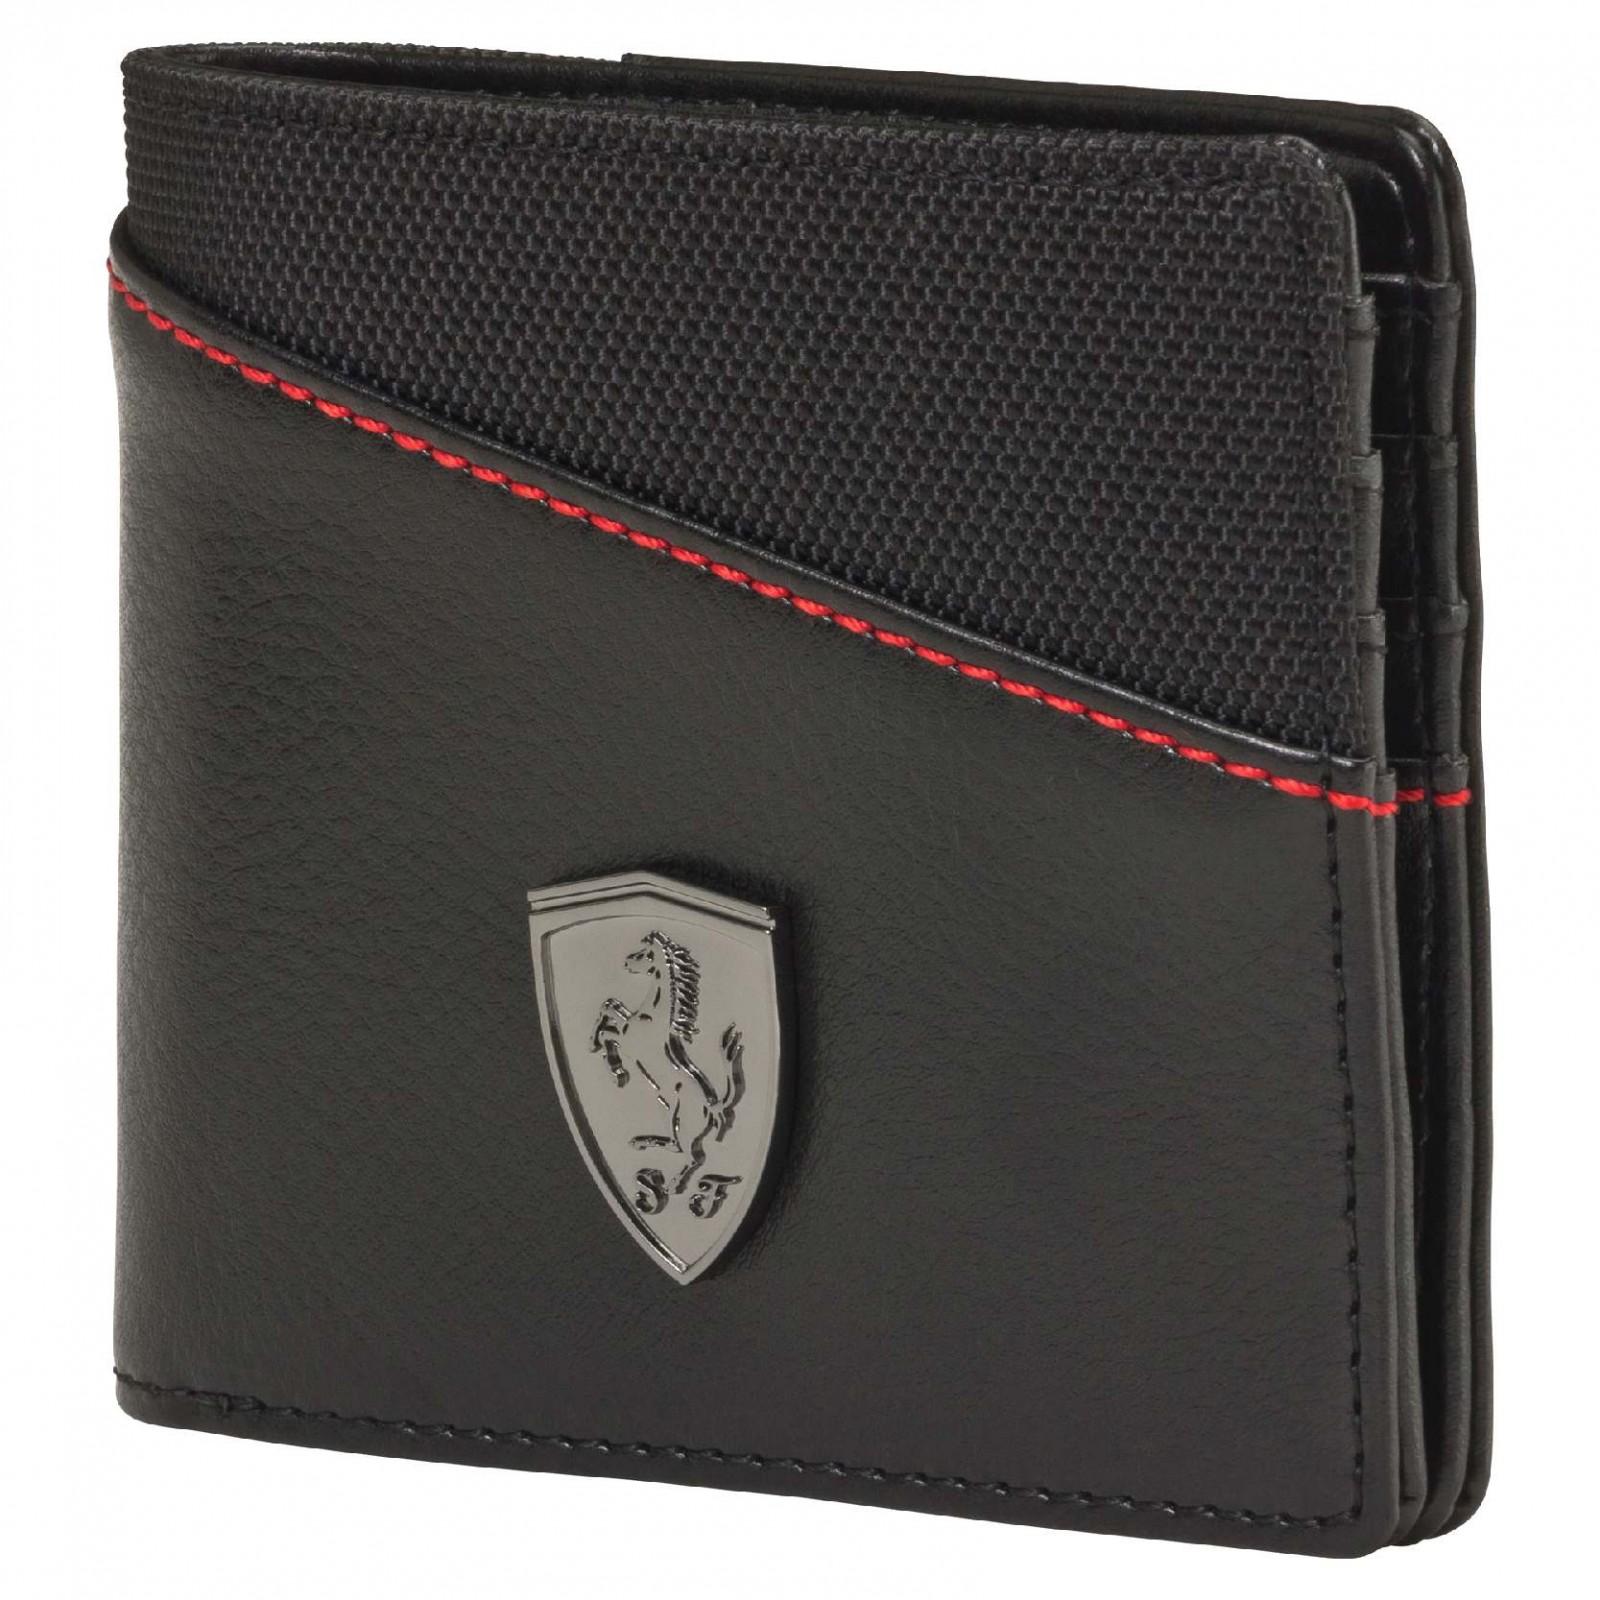 2f4b44872b0 Pánská peněženka Puma Ferrari Ferrari LS Wallet M black